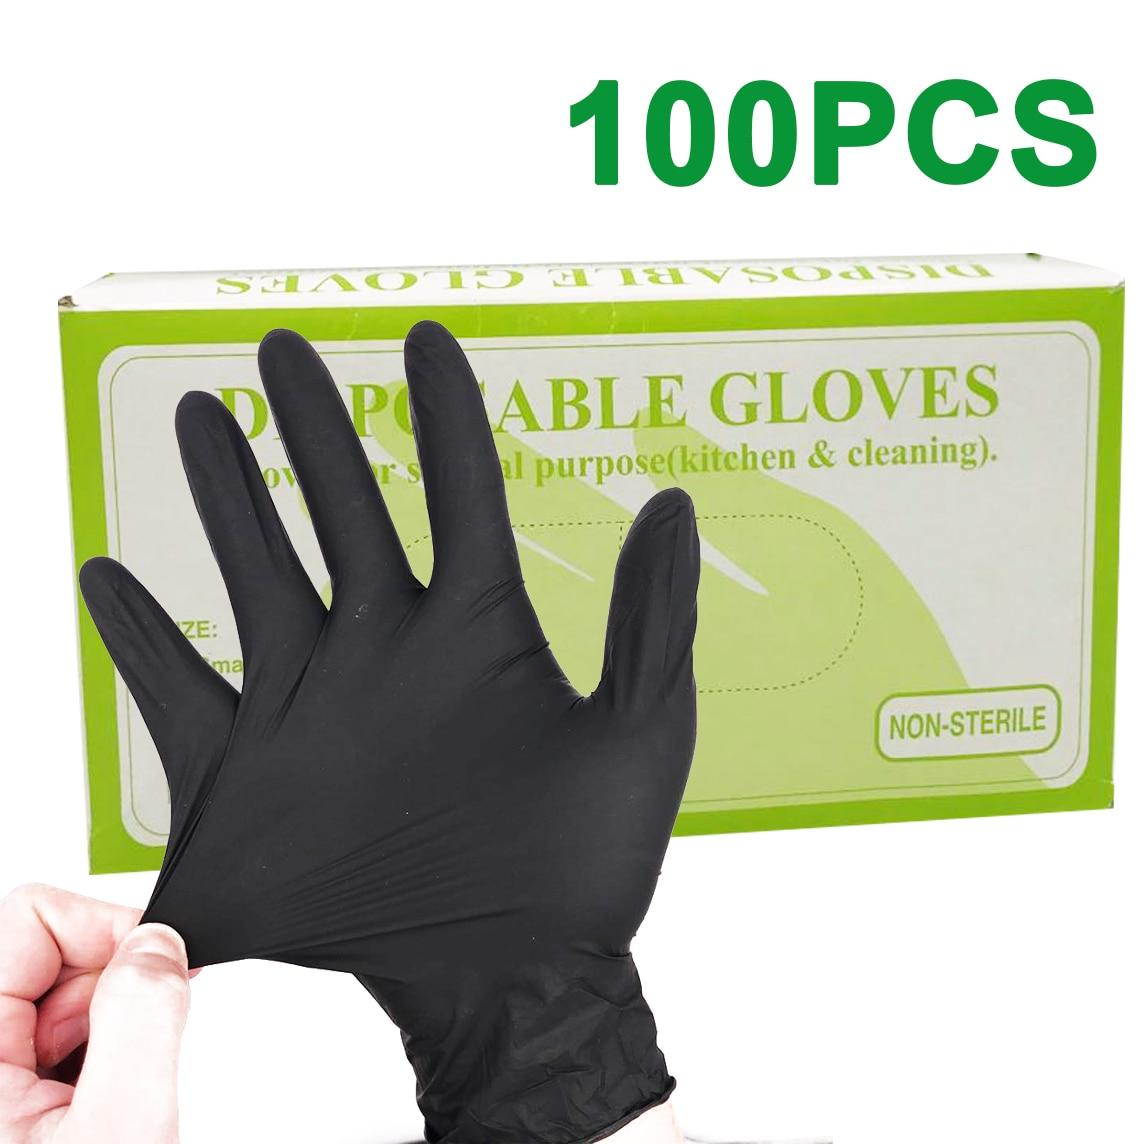 100pcs/lot Nitrile Gloves Black Food Grade Waterproof Allergy Free Medical Disposable Work Safety Gloves Nitrile Gloves Mechanic